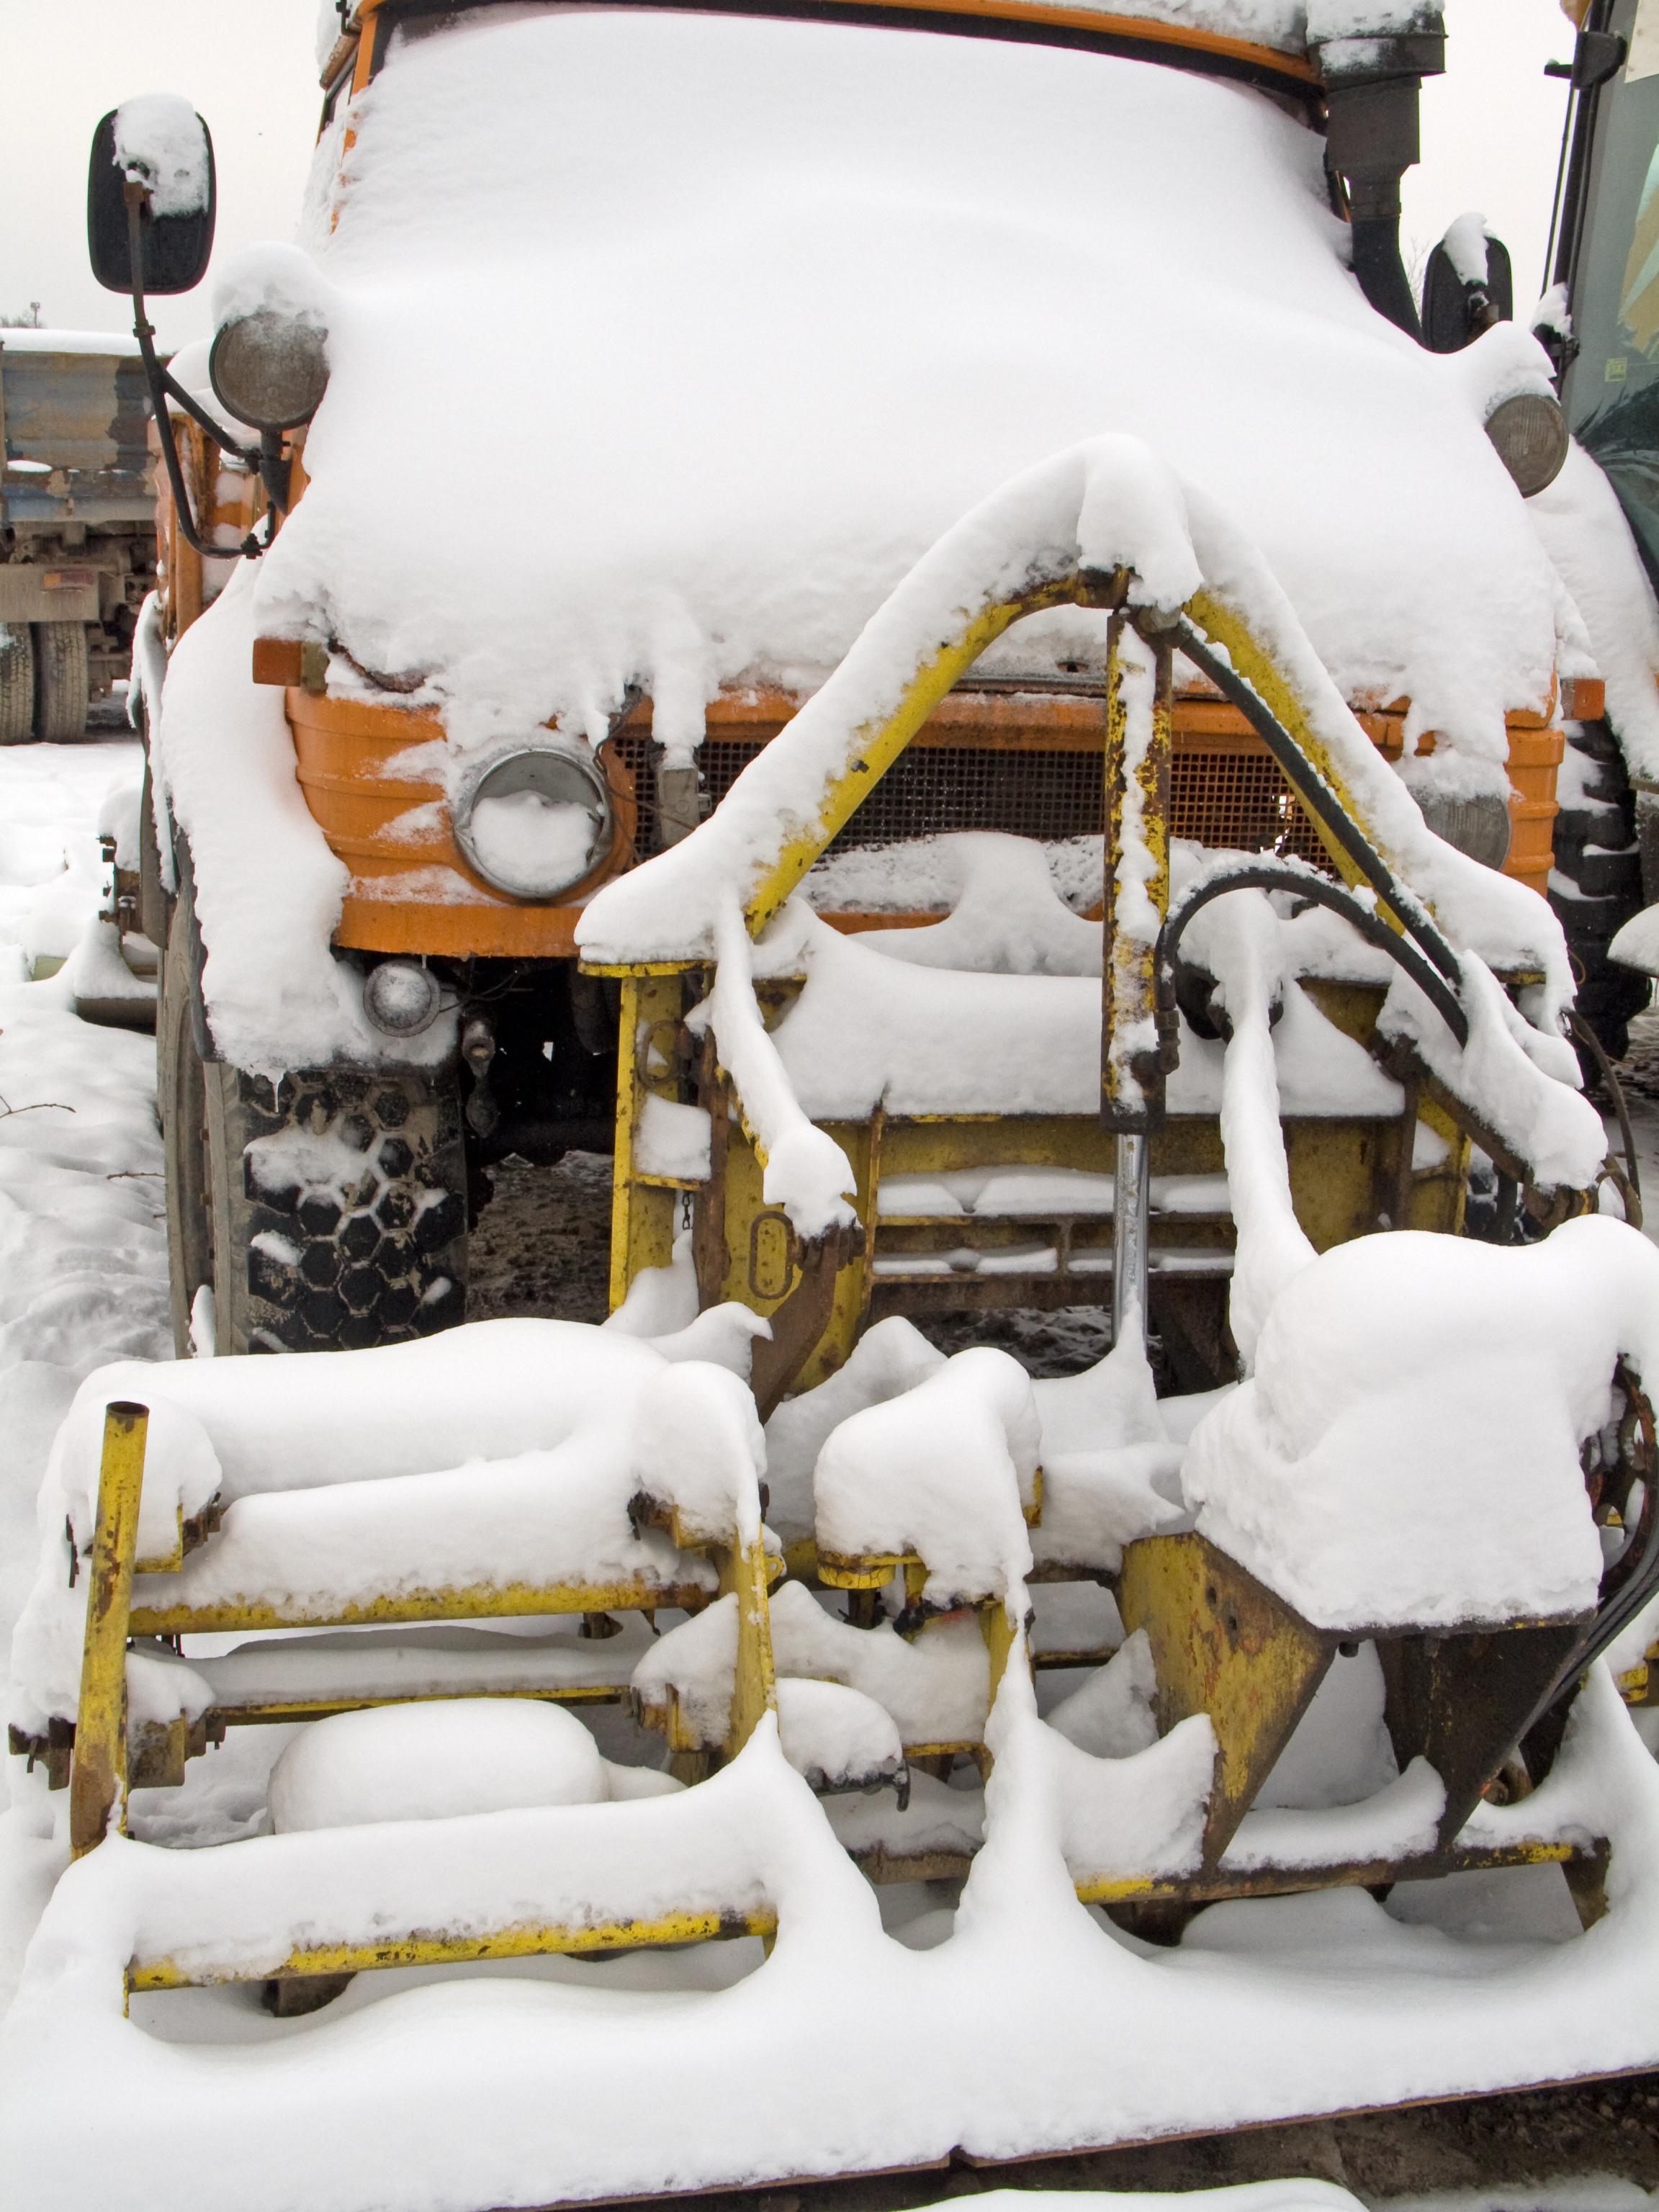 Snow bf255b864b6bf2503d17ae040513976dbb2c7bbb993543ddabb25c2e0e7e13fc